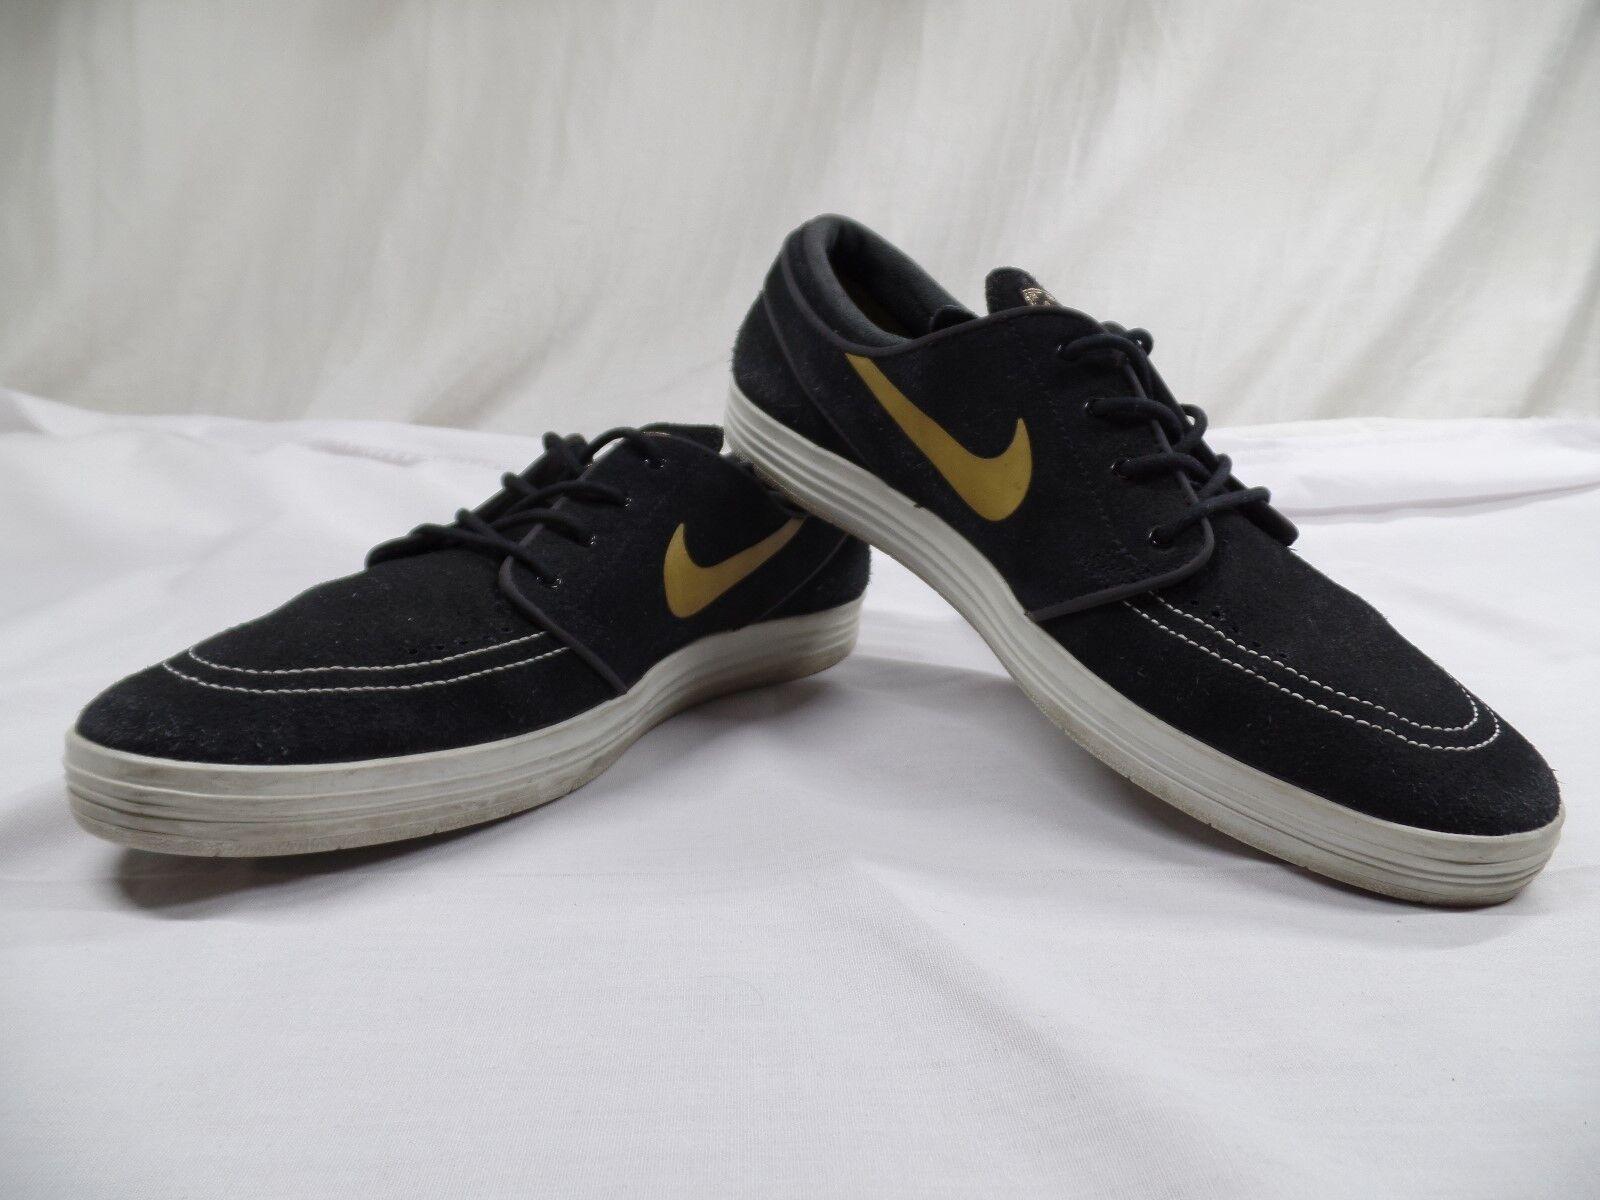 Nike sb lunar stefan janoski schwarze schuhe 654857-071 - sz-11.5)